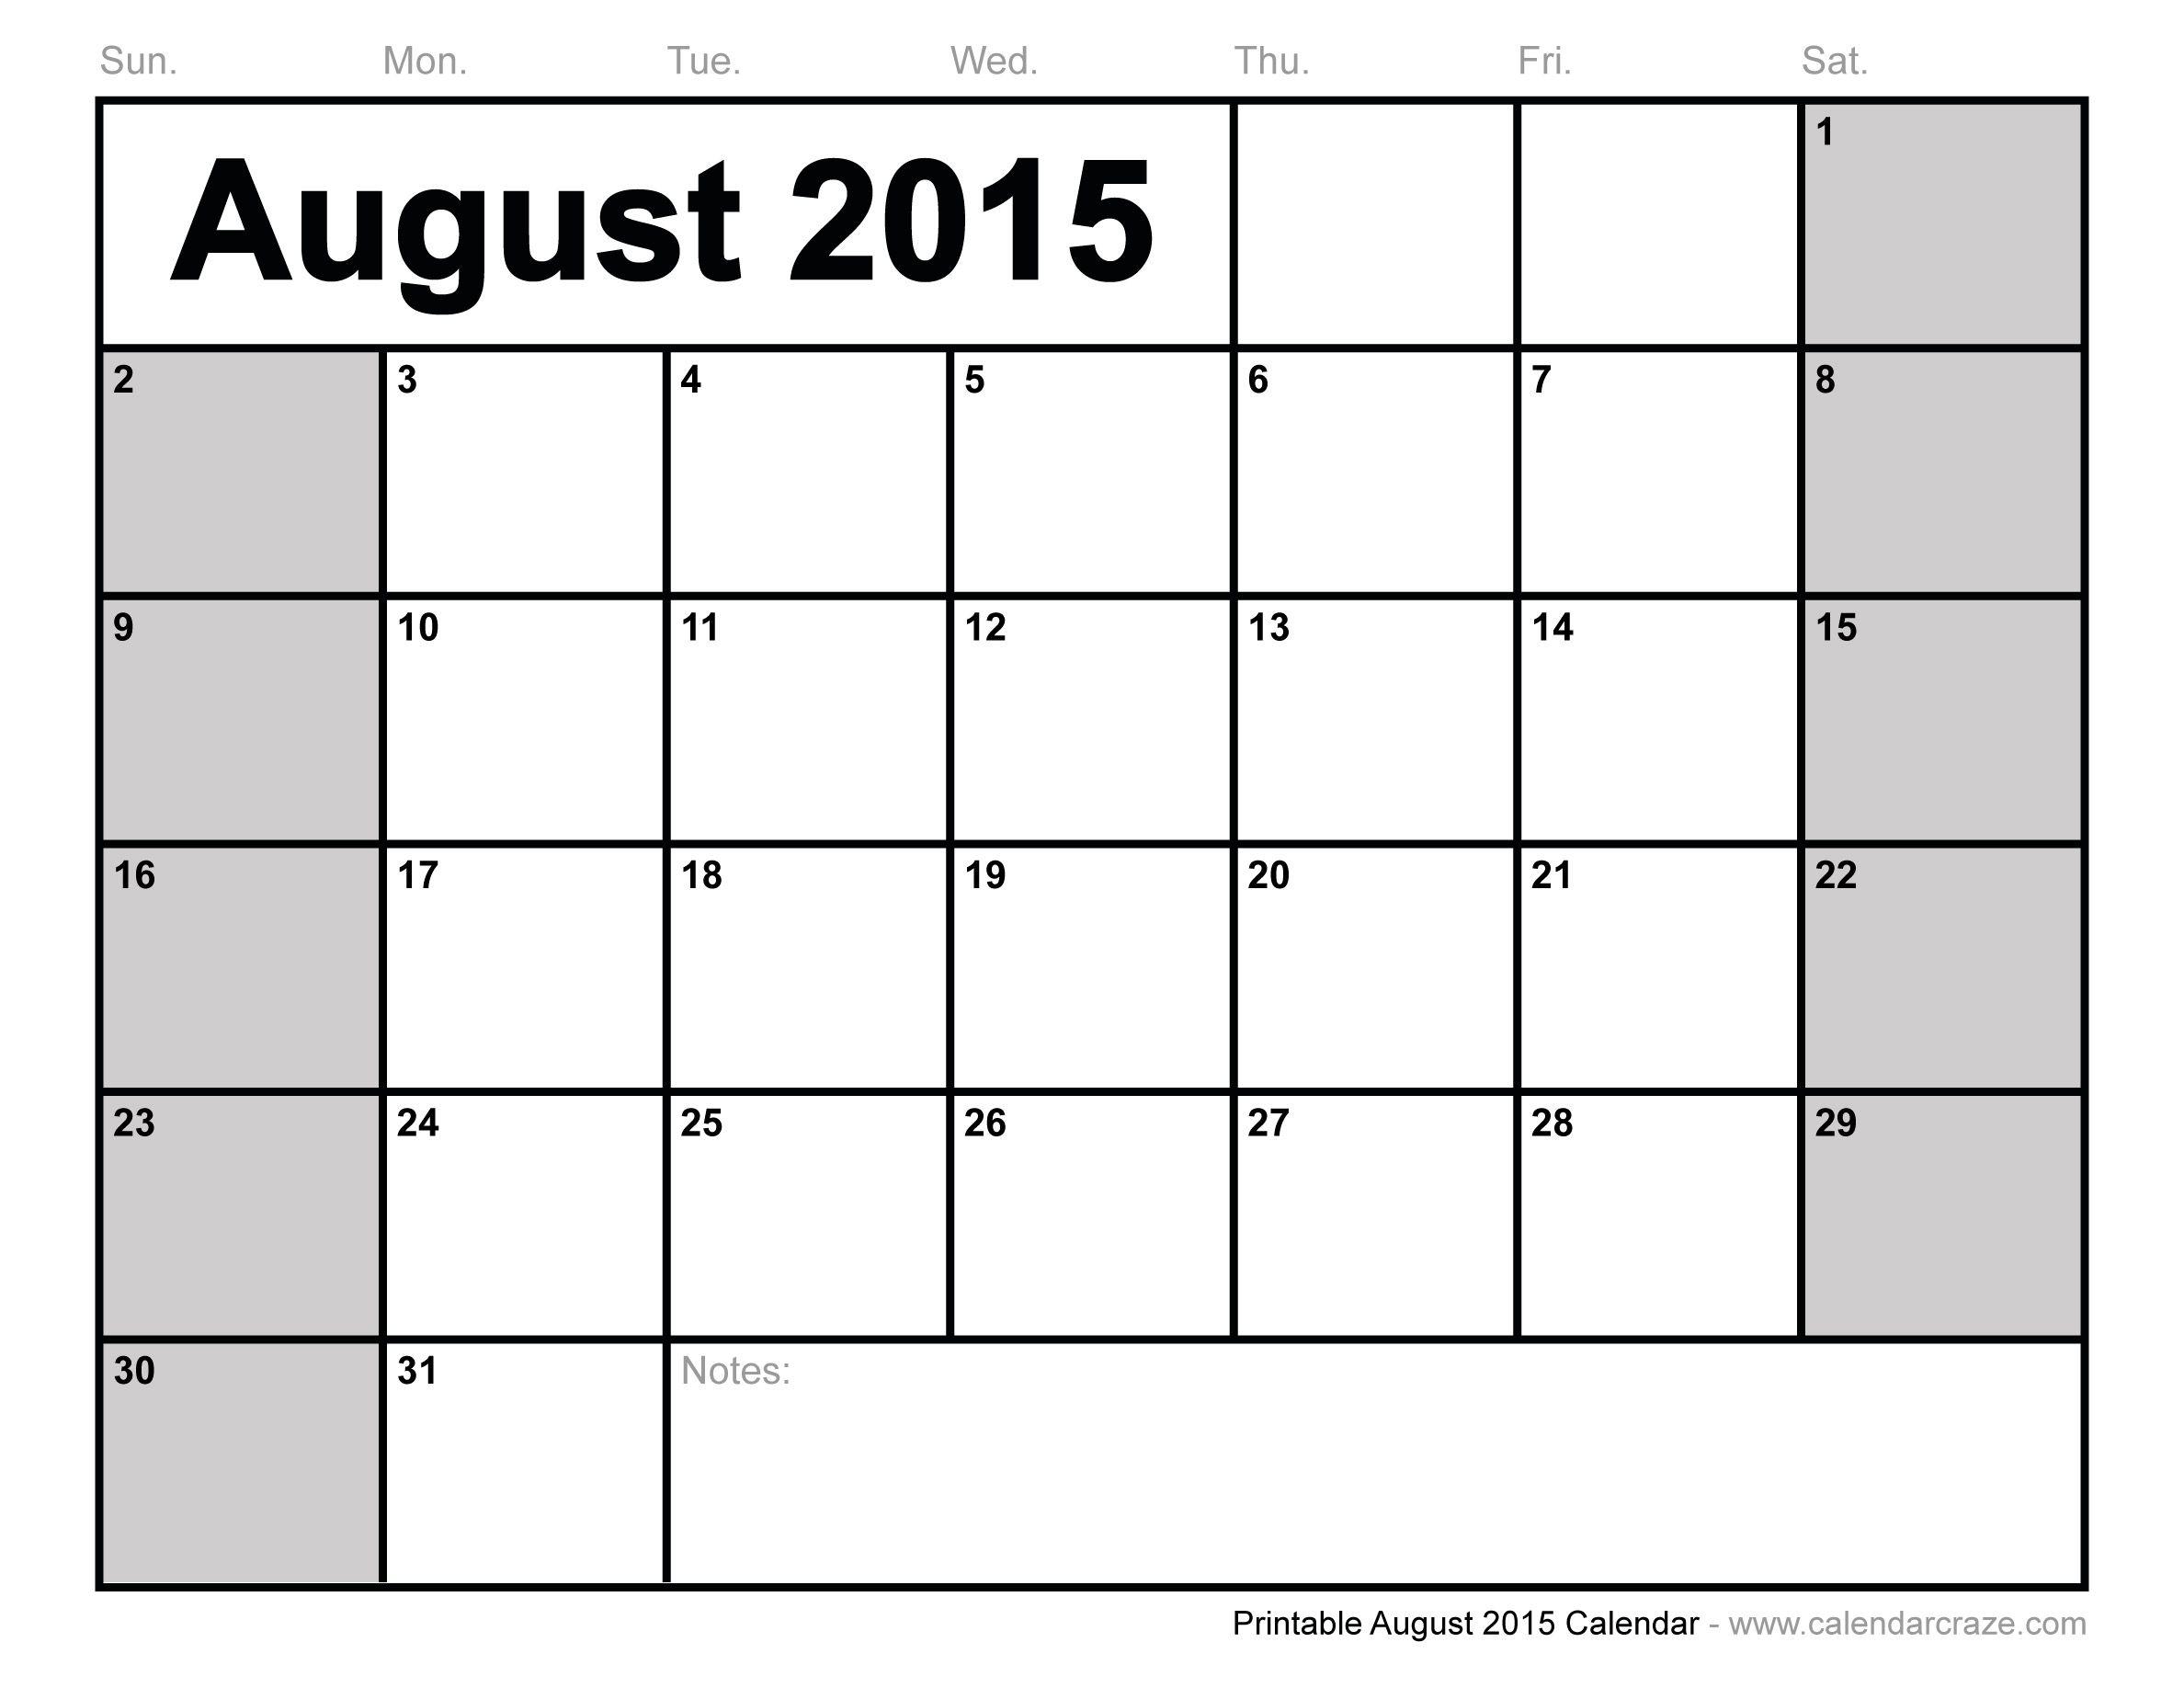 August 2015 Calendar - This Calendar Portal provides you Free ...